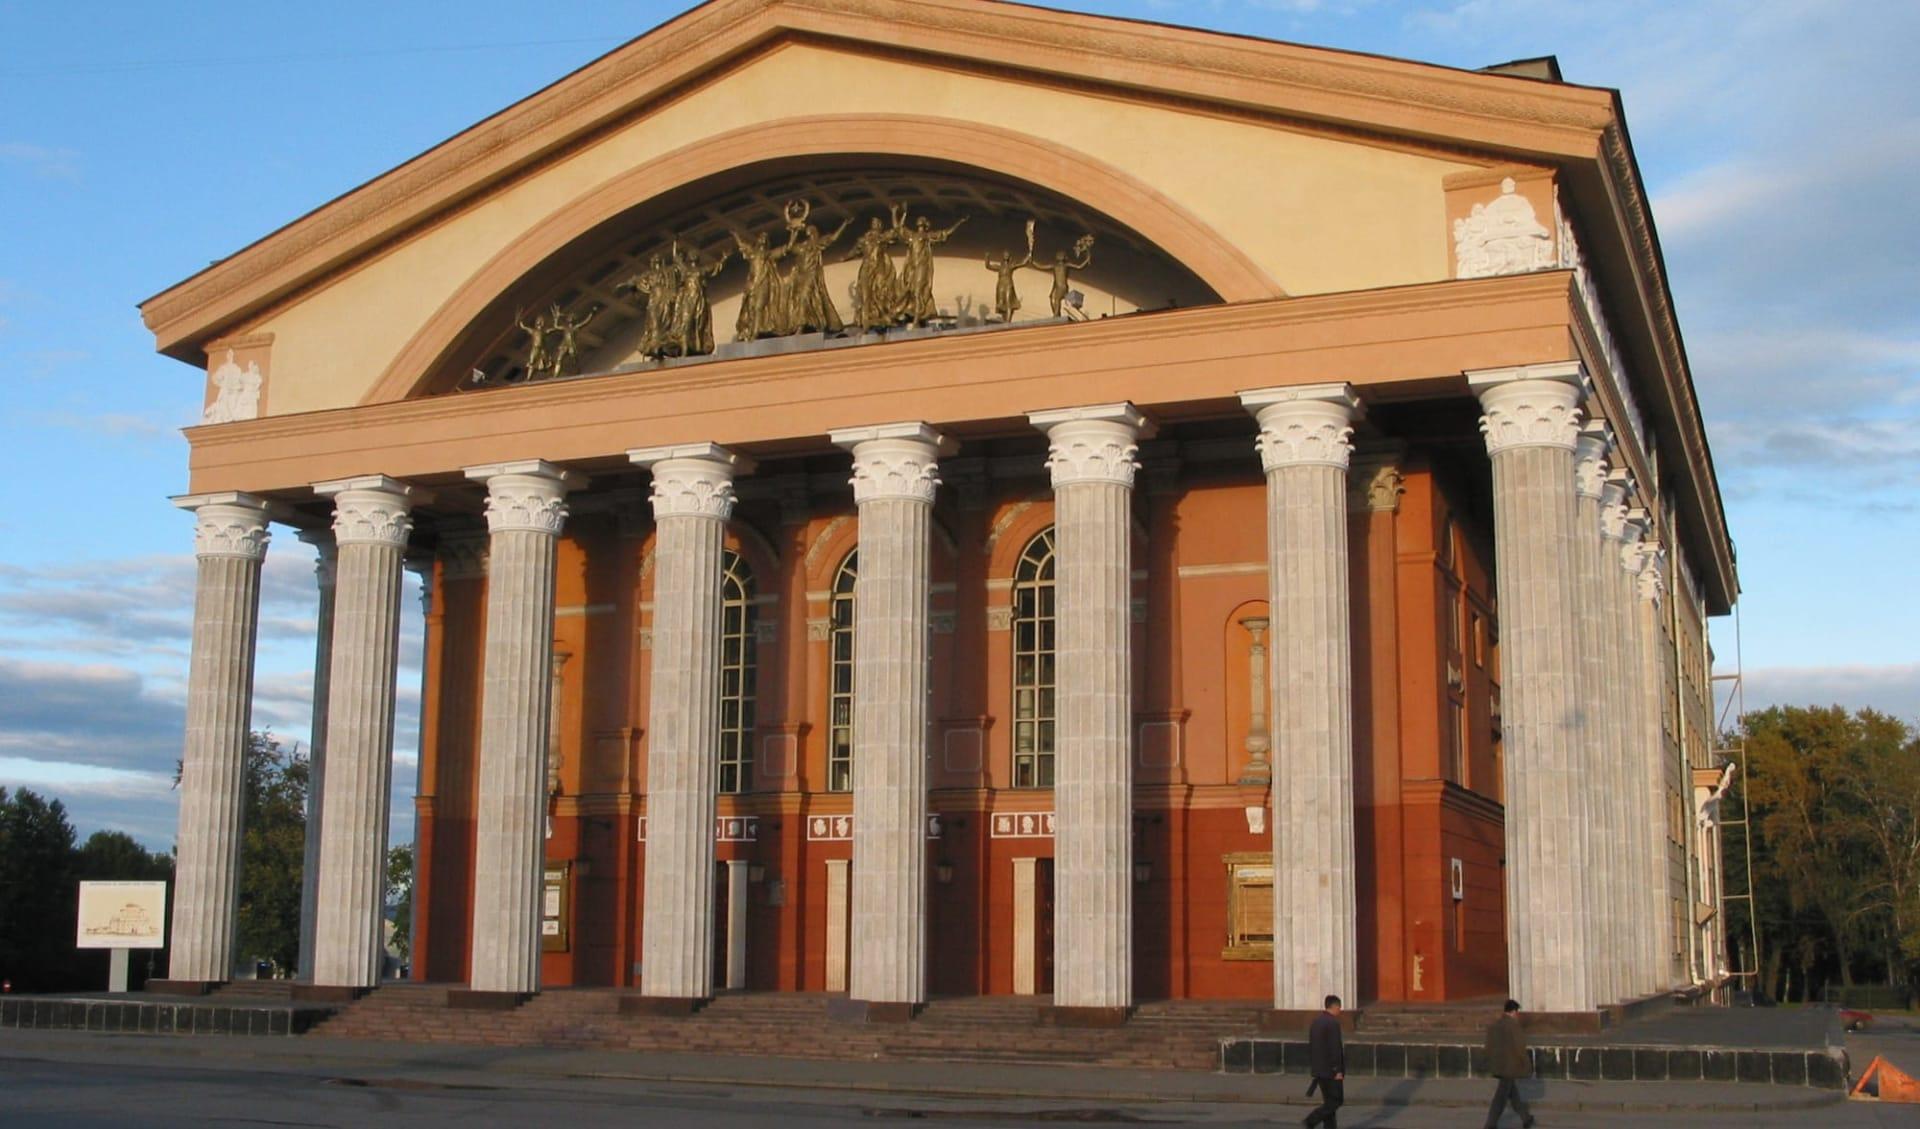 Bezauberndes Karelien ab St. Petersburg: Russland - Petrozavodsk - Theater